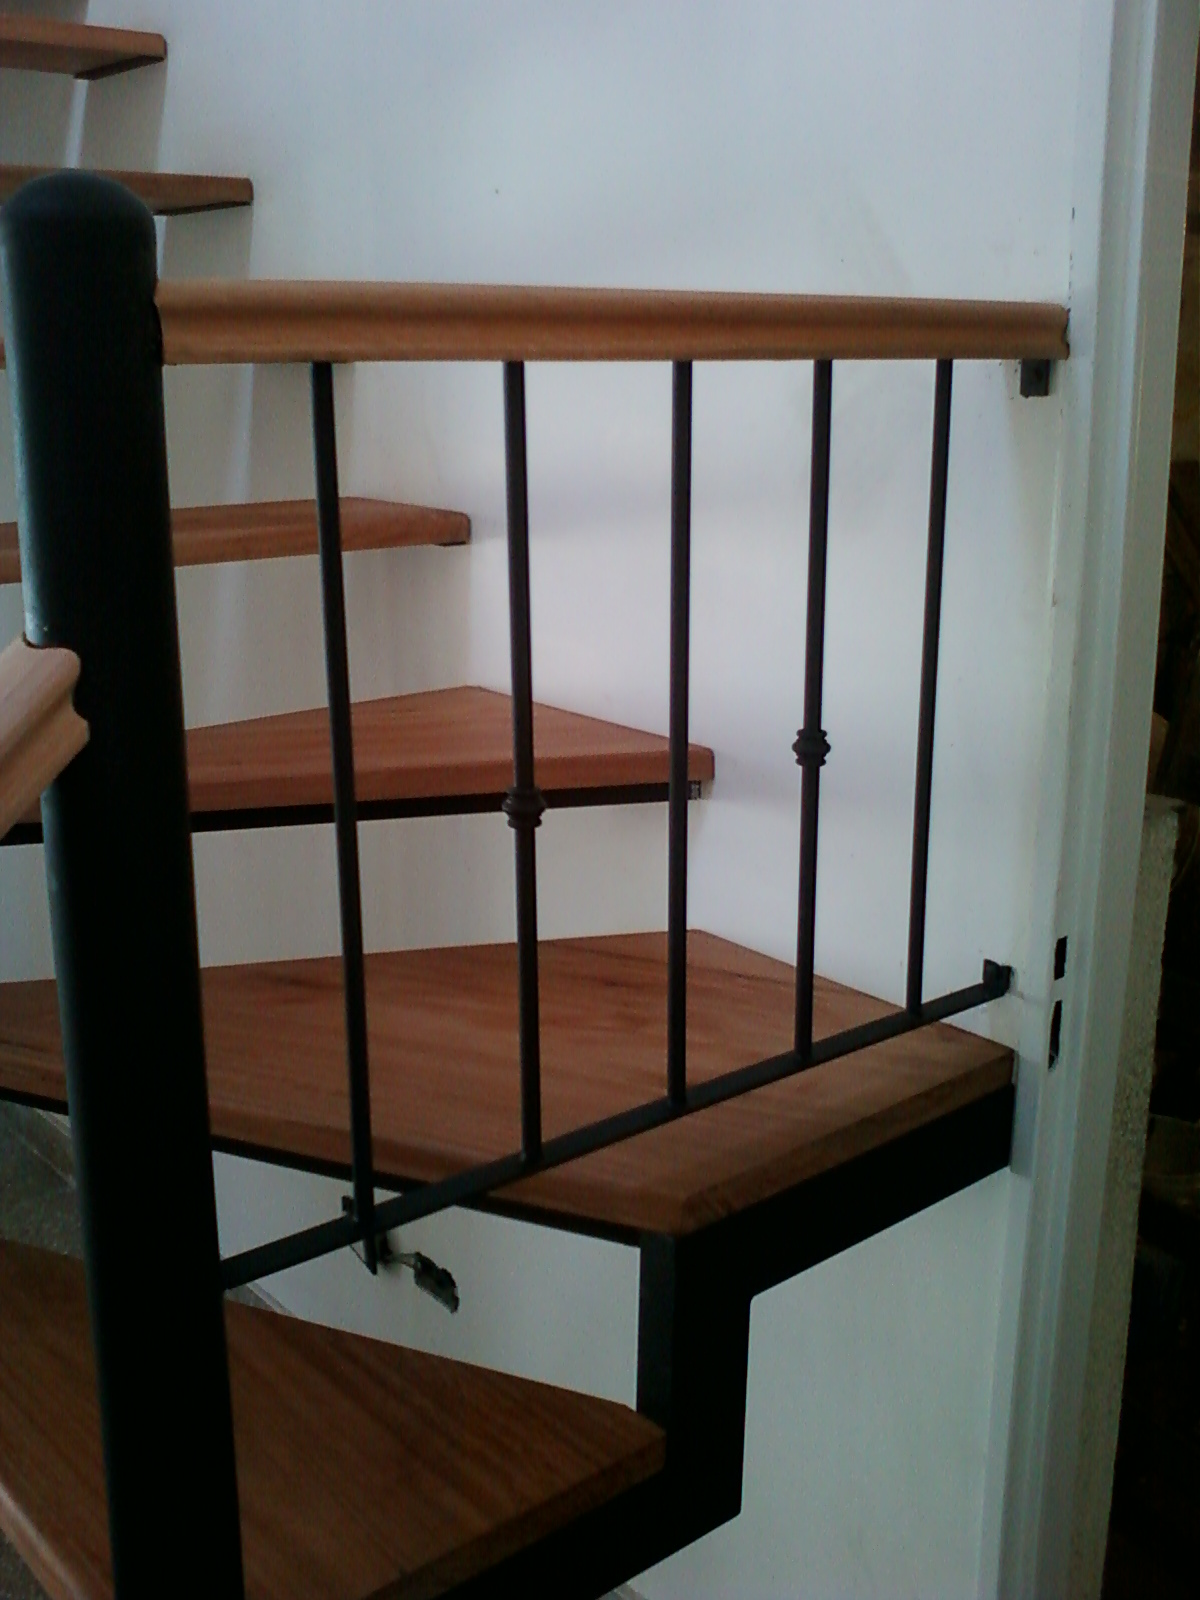 Rodr guez e hijo herrer a y carpinter a de obra - Barandas para escaleras de hierro ...